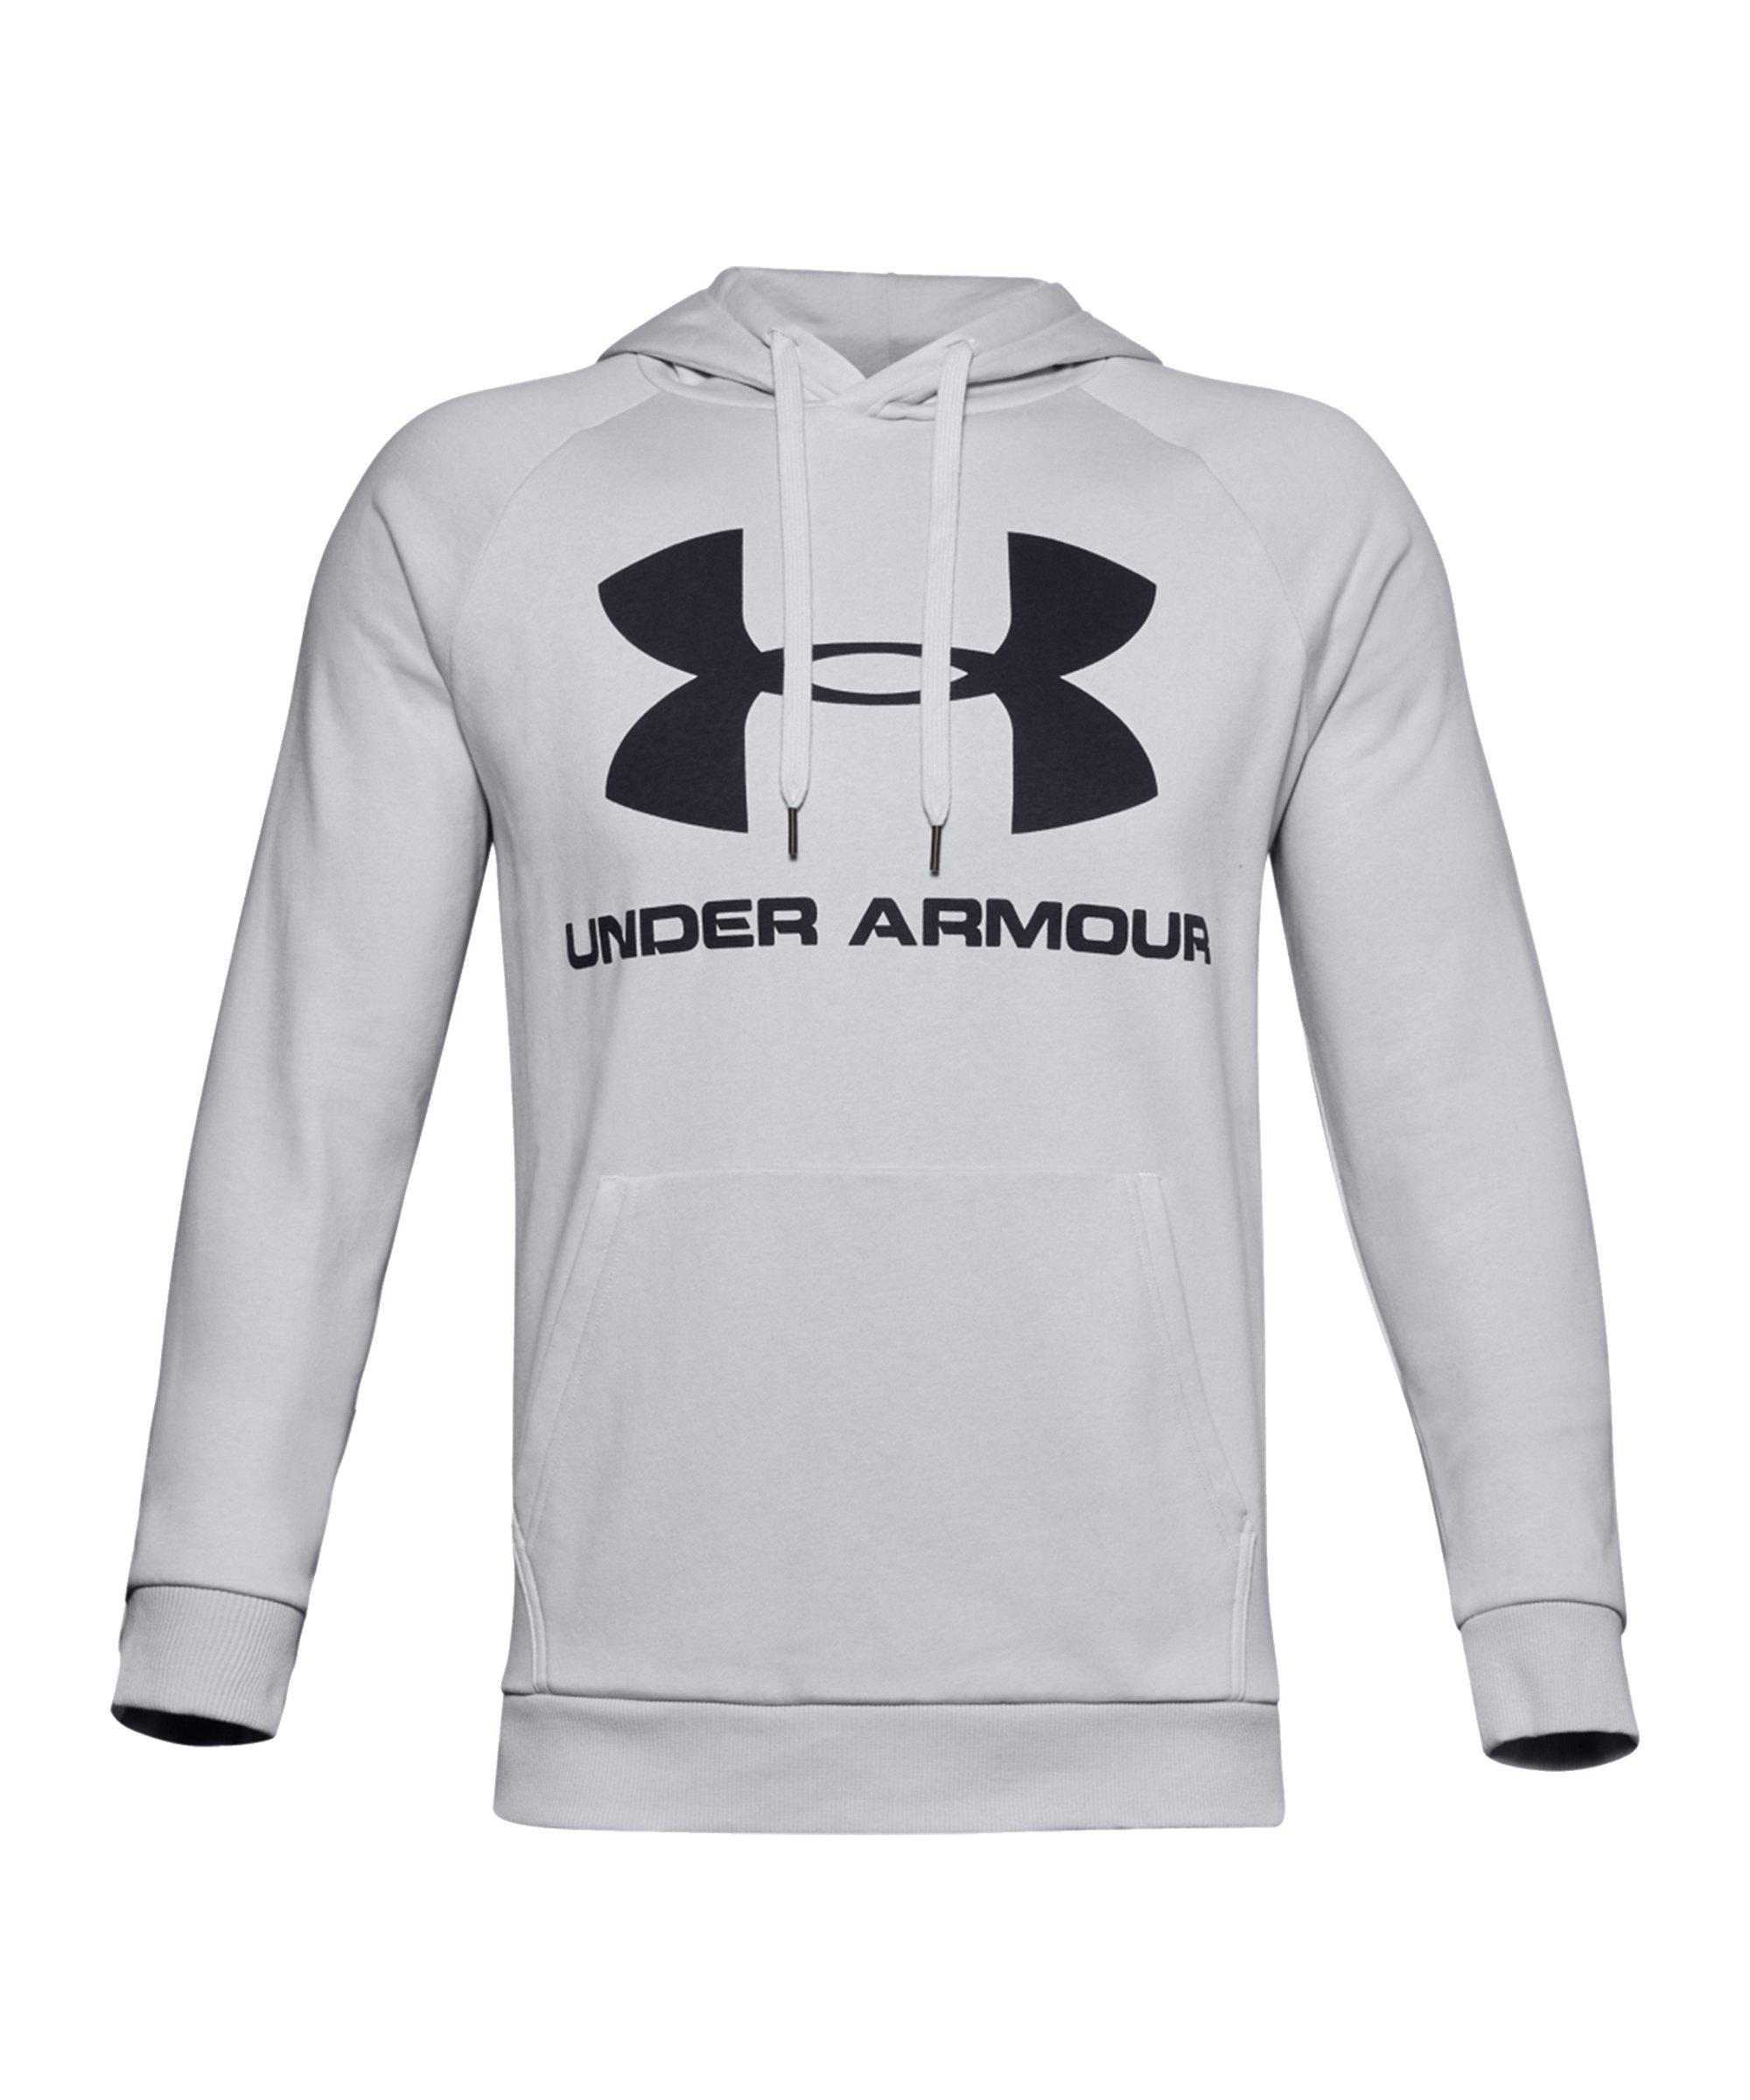 Under Armour RivalFleece Sportstyle Hoody F014 - grau